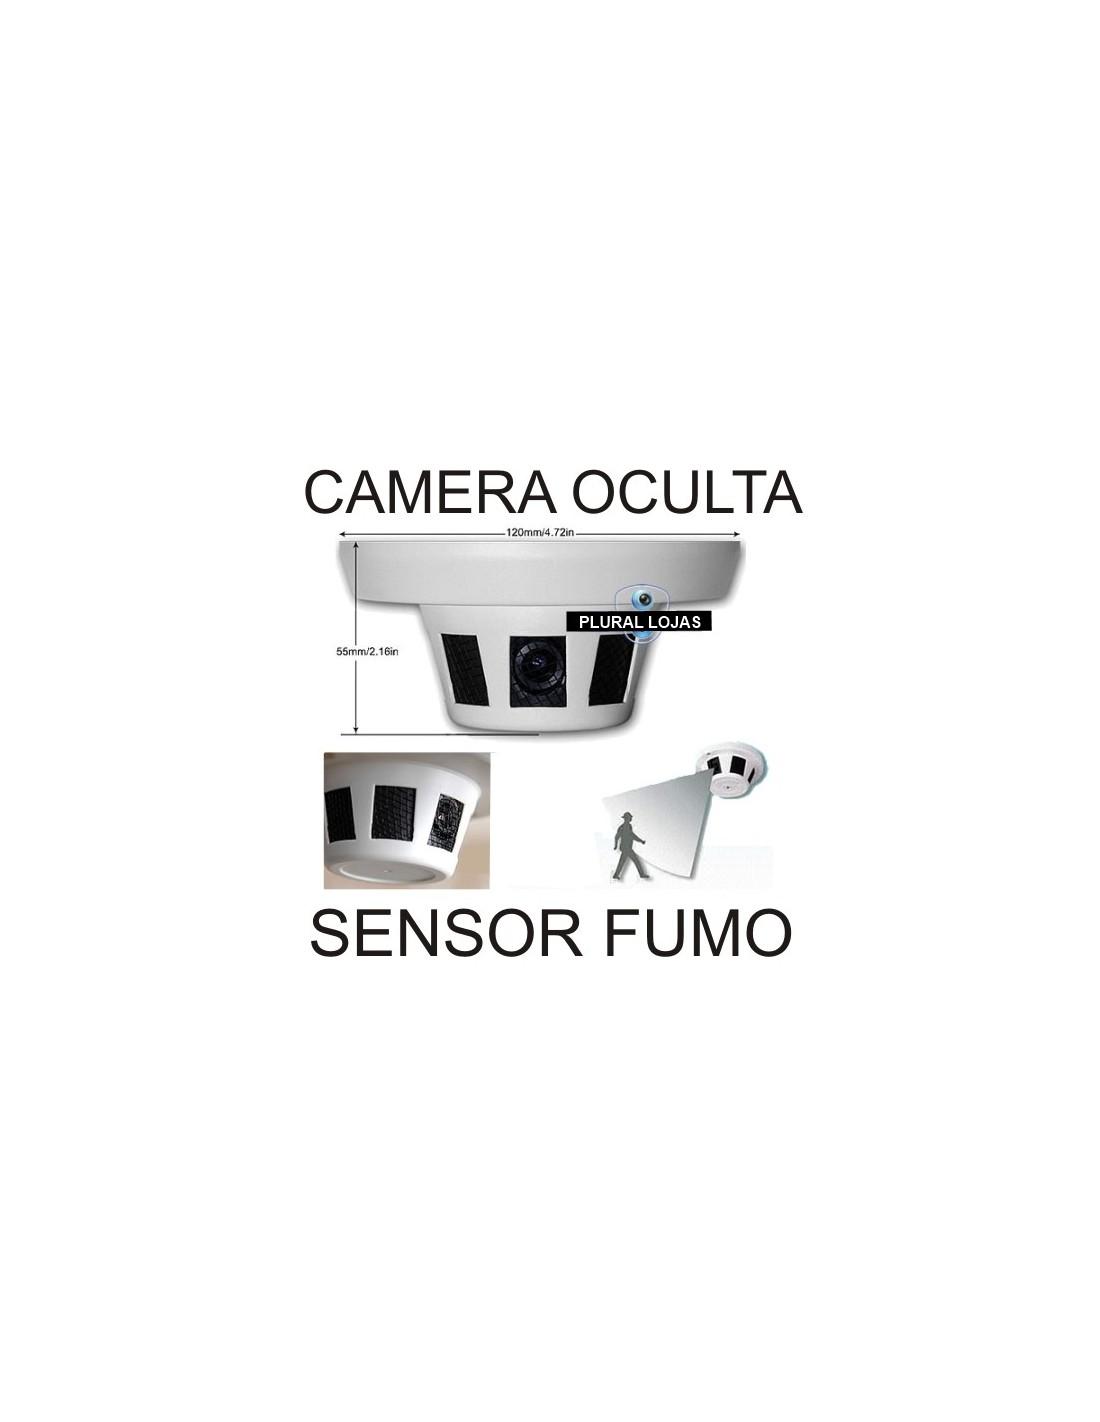 Camera sensor fumo - Camera de vigilancia ...